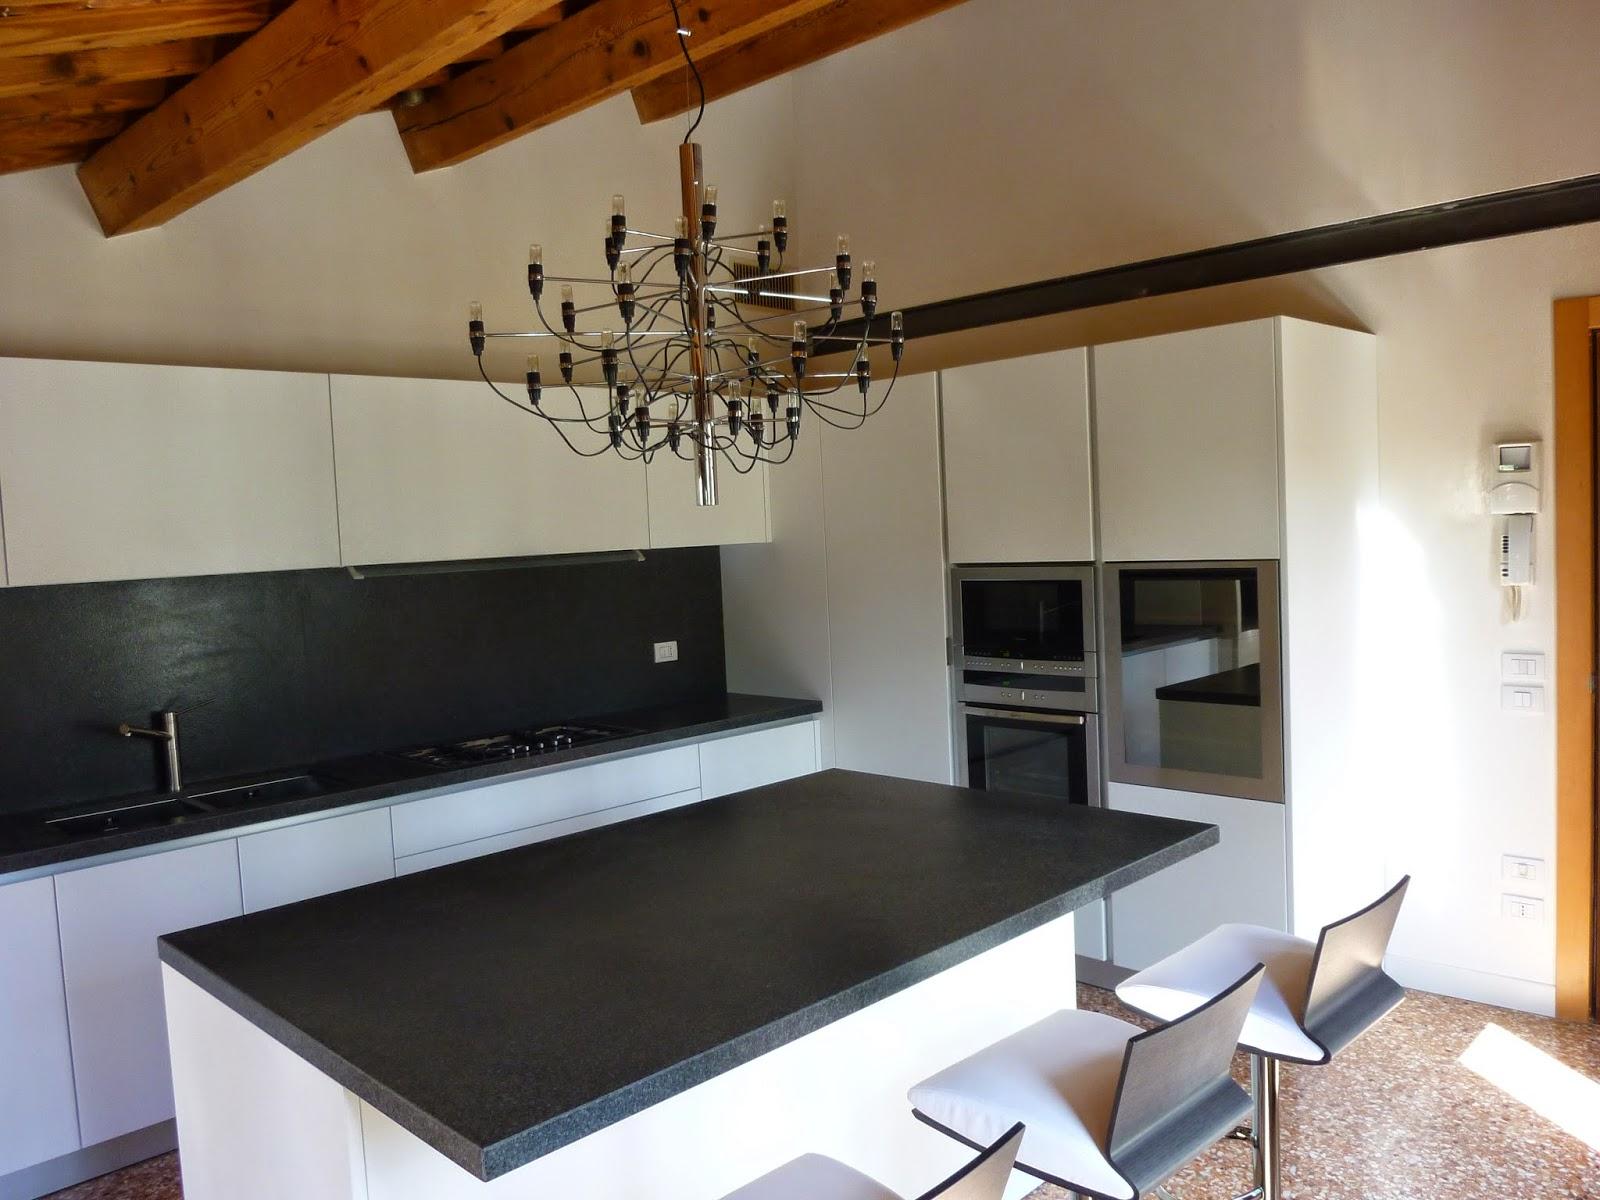 Top cucina nero assoluto: piano cucina materiali. simple top cucina